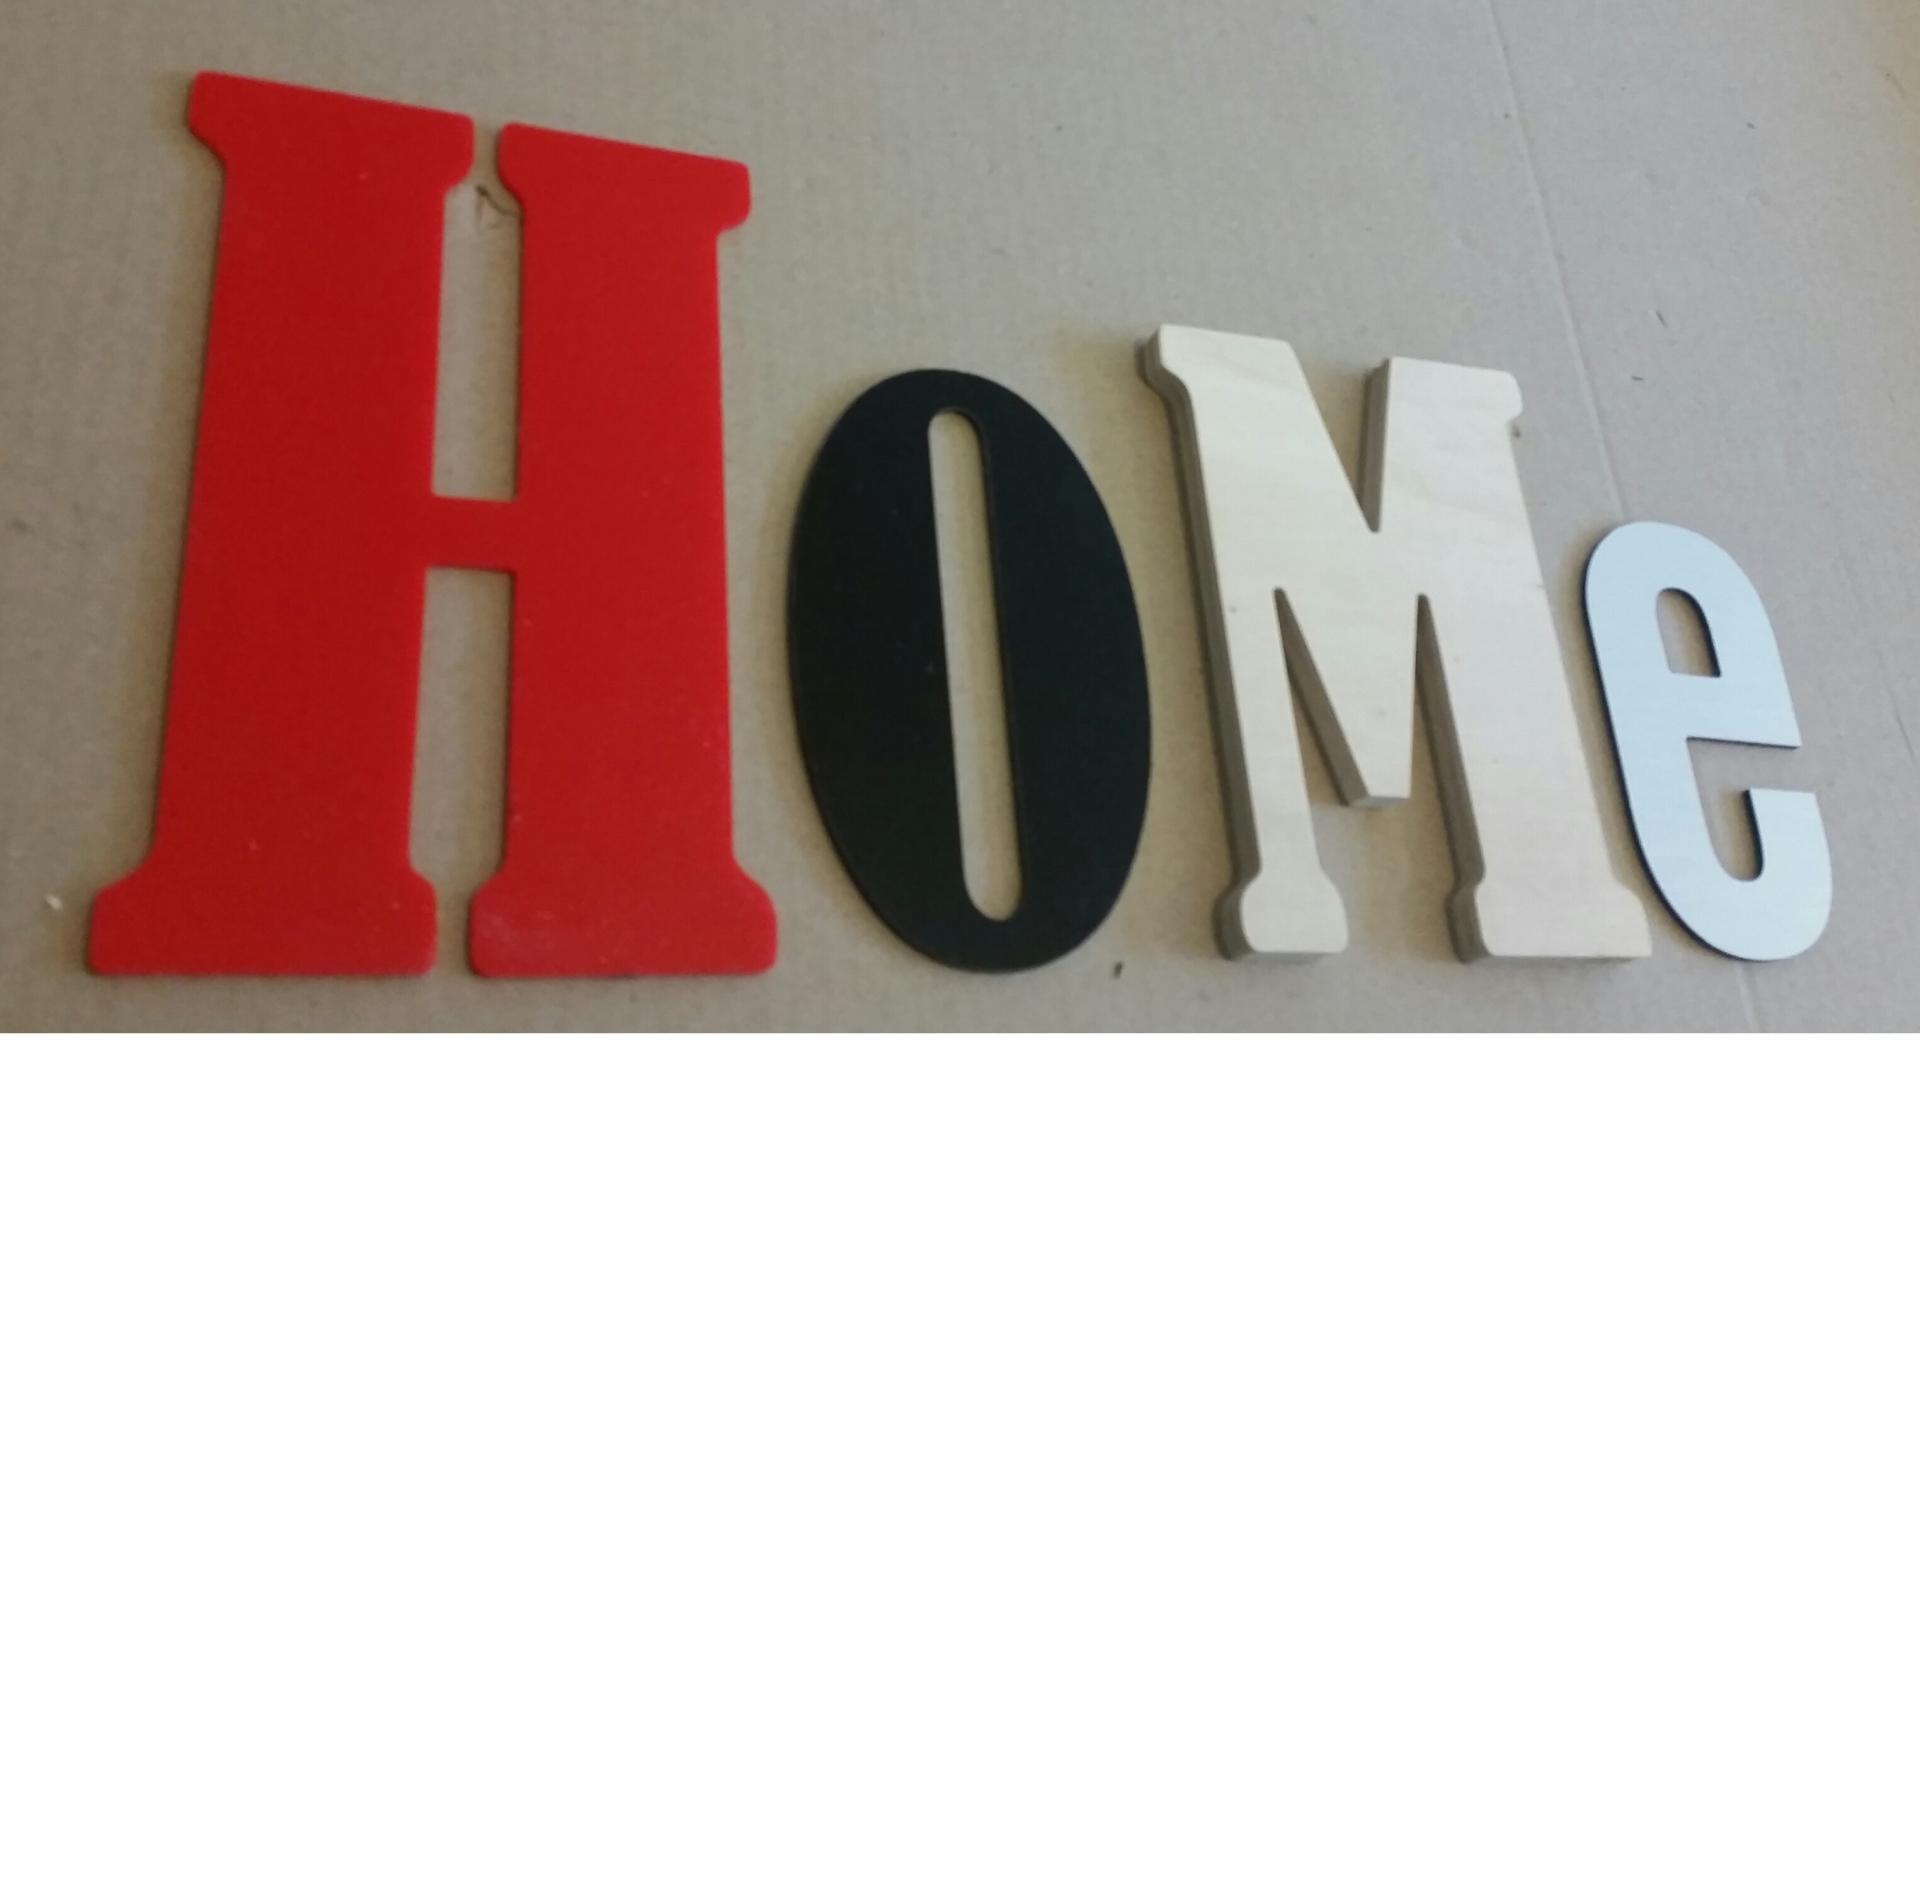 Lettre decorative home lot 0011